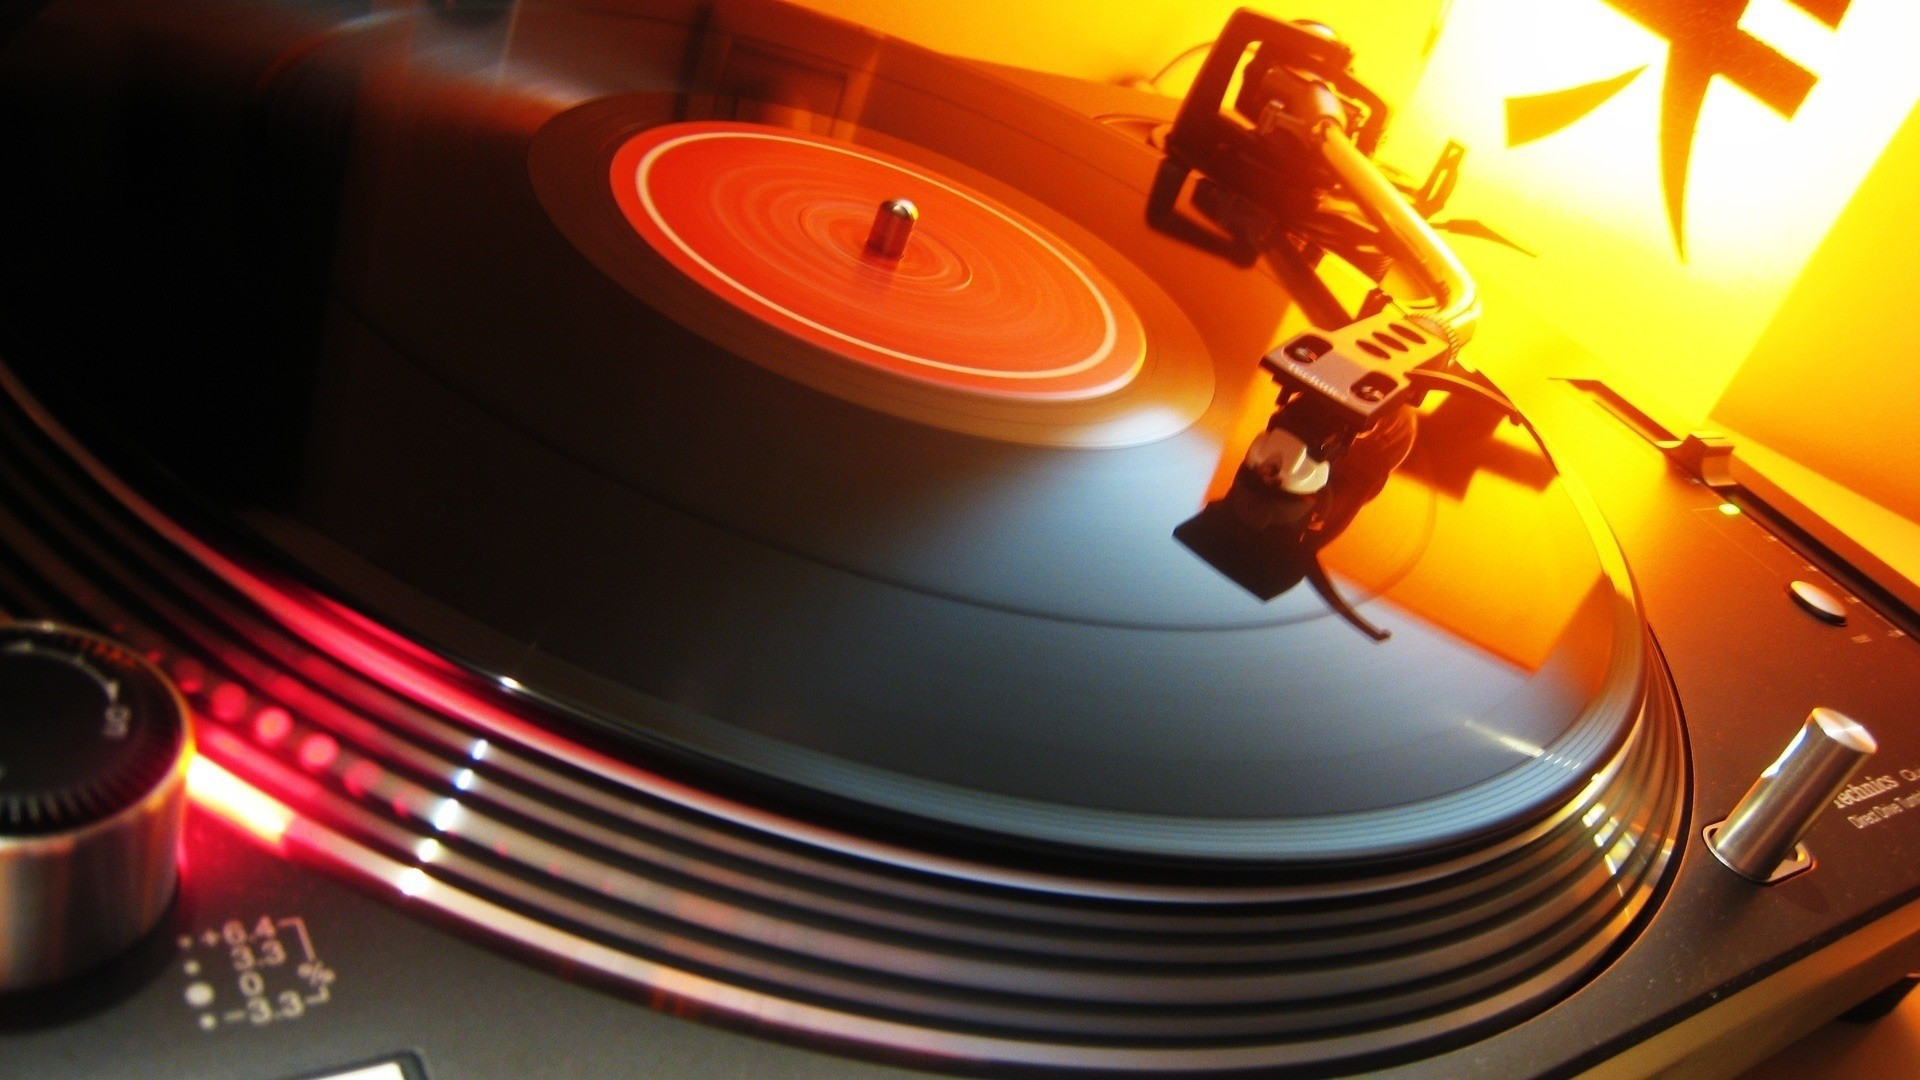 General 1920x1080 turntables DJ vinyl music technology